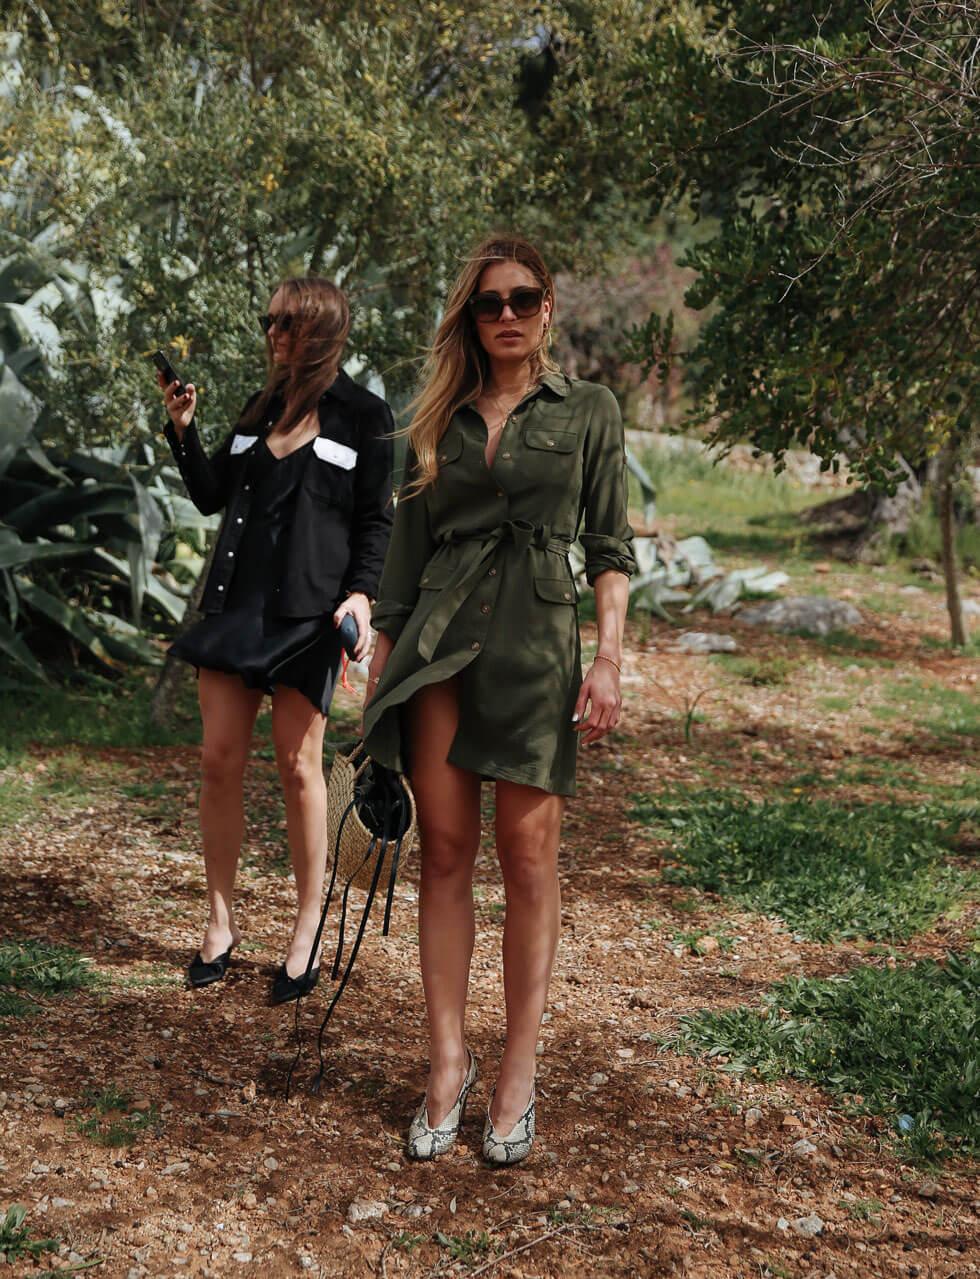 Adoore-safaridress